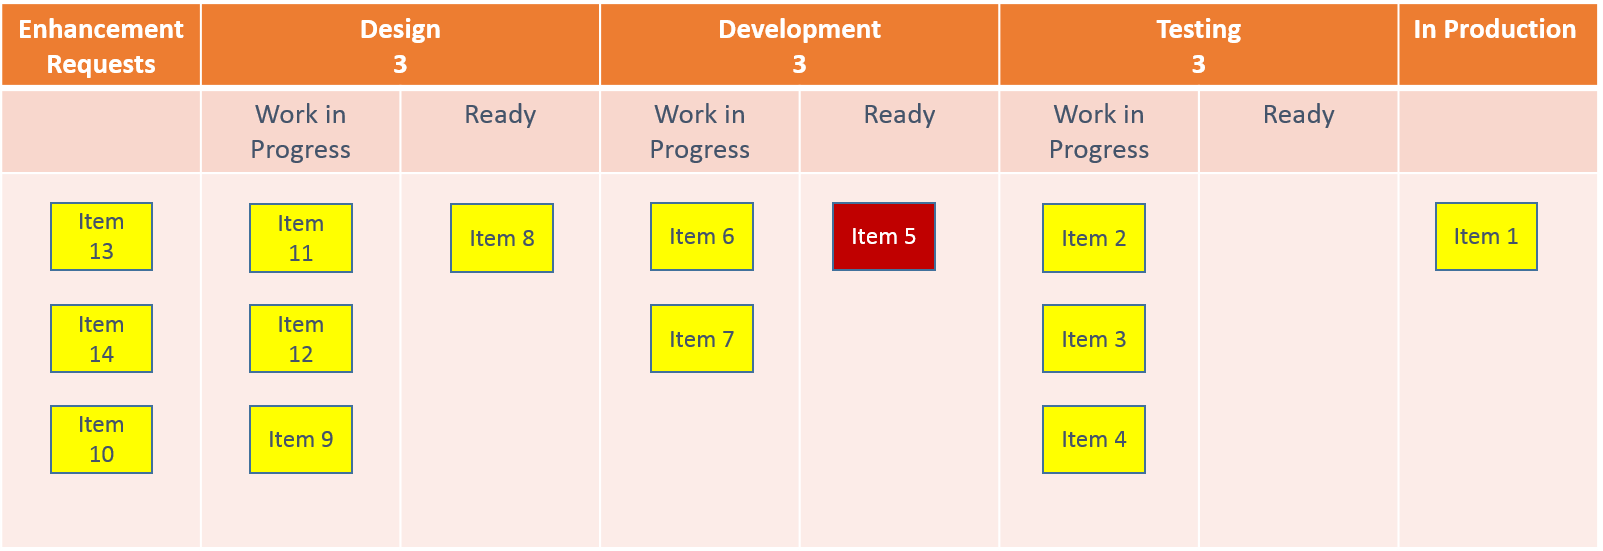 DevelopmentKanbanBoard